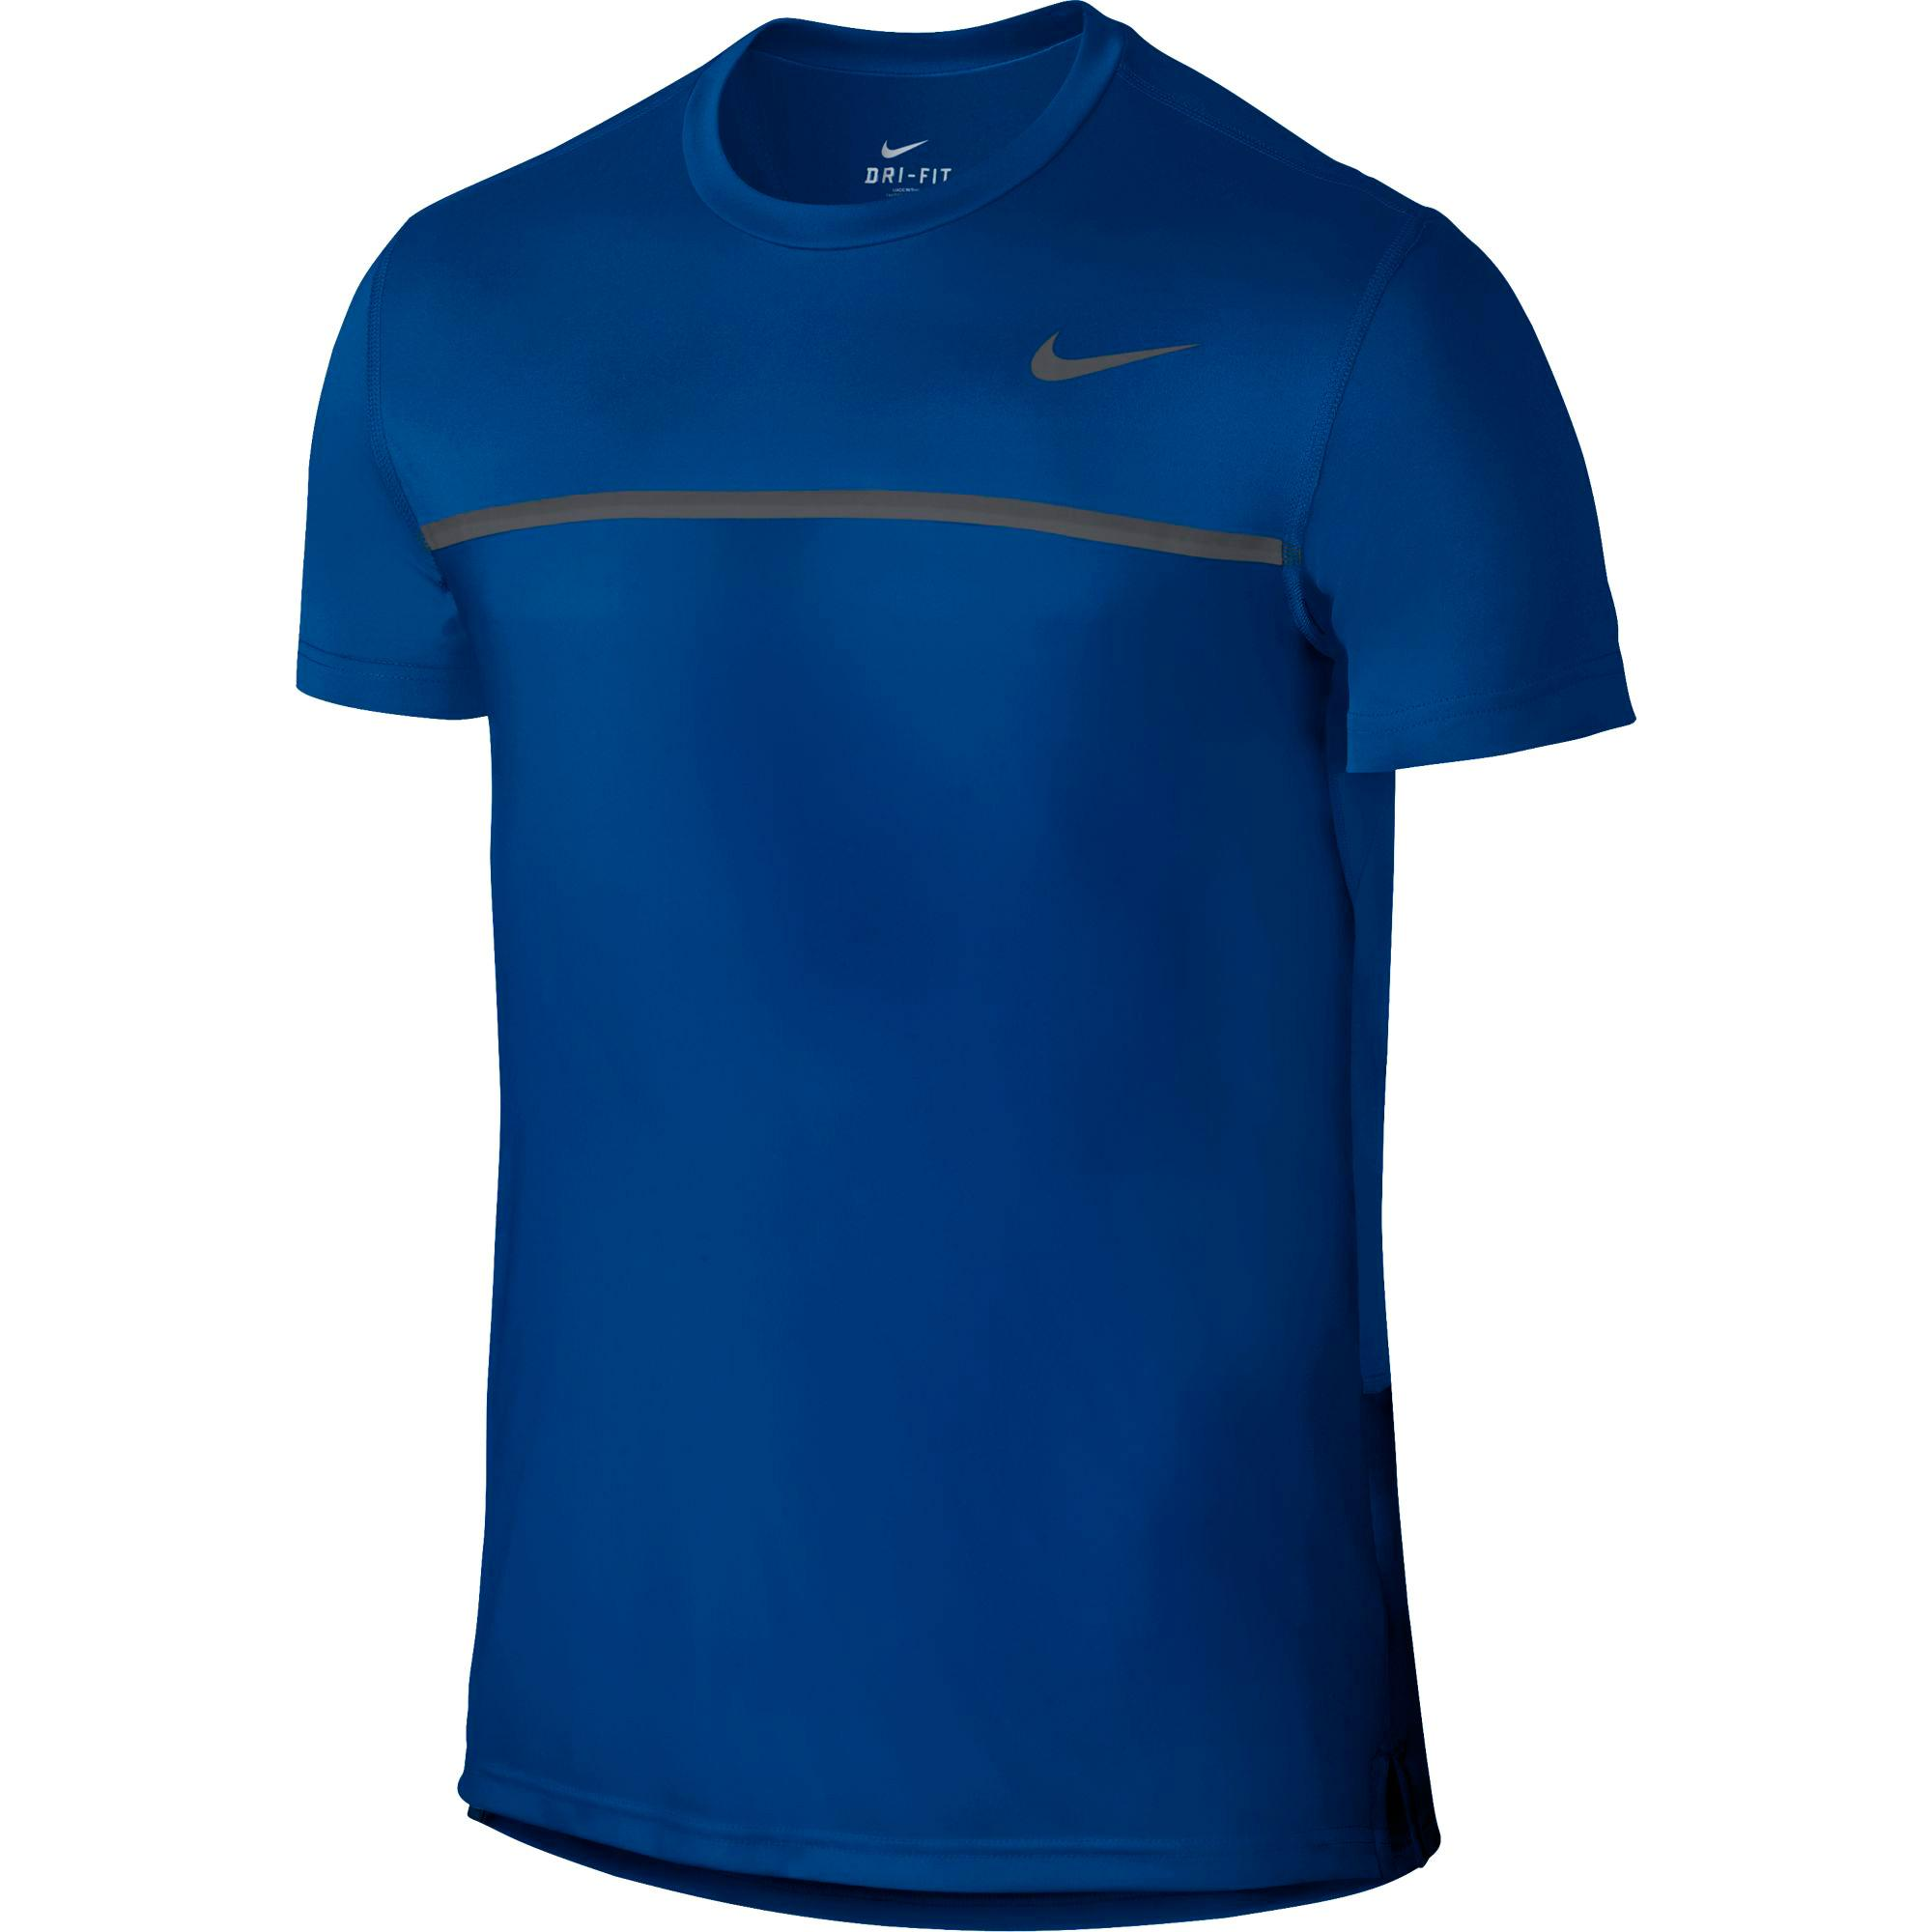 nike mens challenger crew neck tennis shirt blue jay. Black Bedroom Furniture Sets. Home Design Ideas